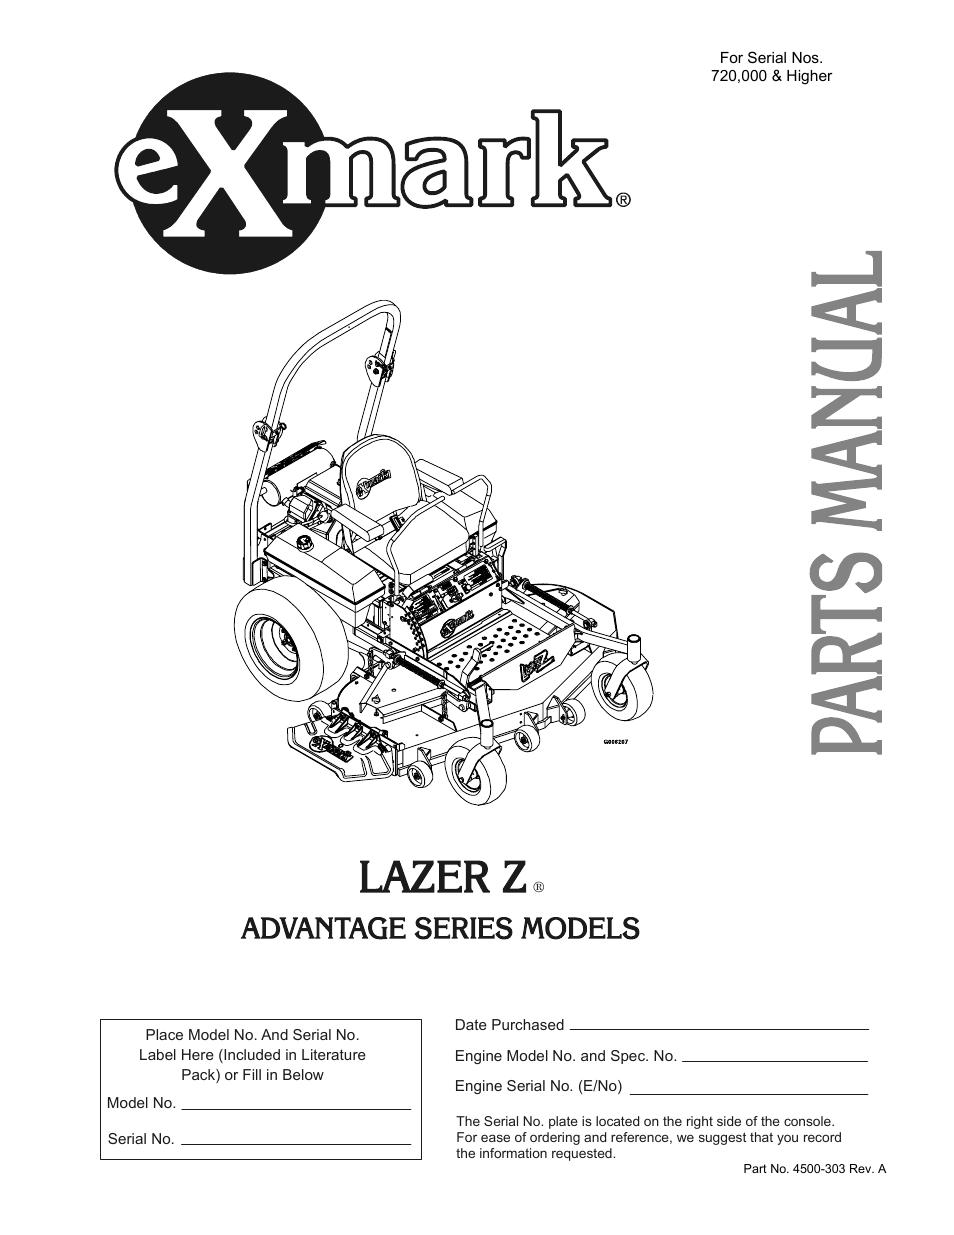 exmark lazer z advantage series user manual 32 pages rh manualsdir com